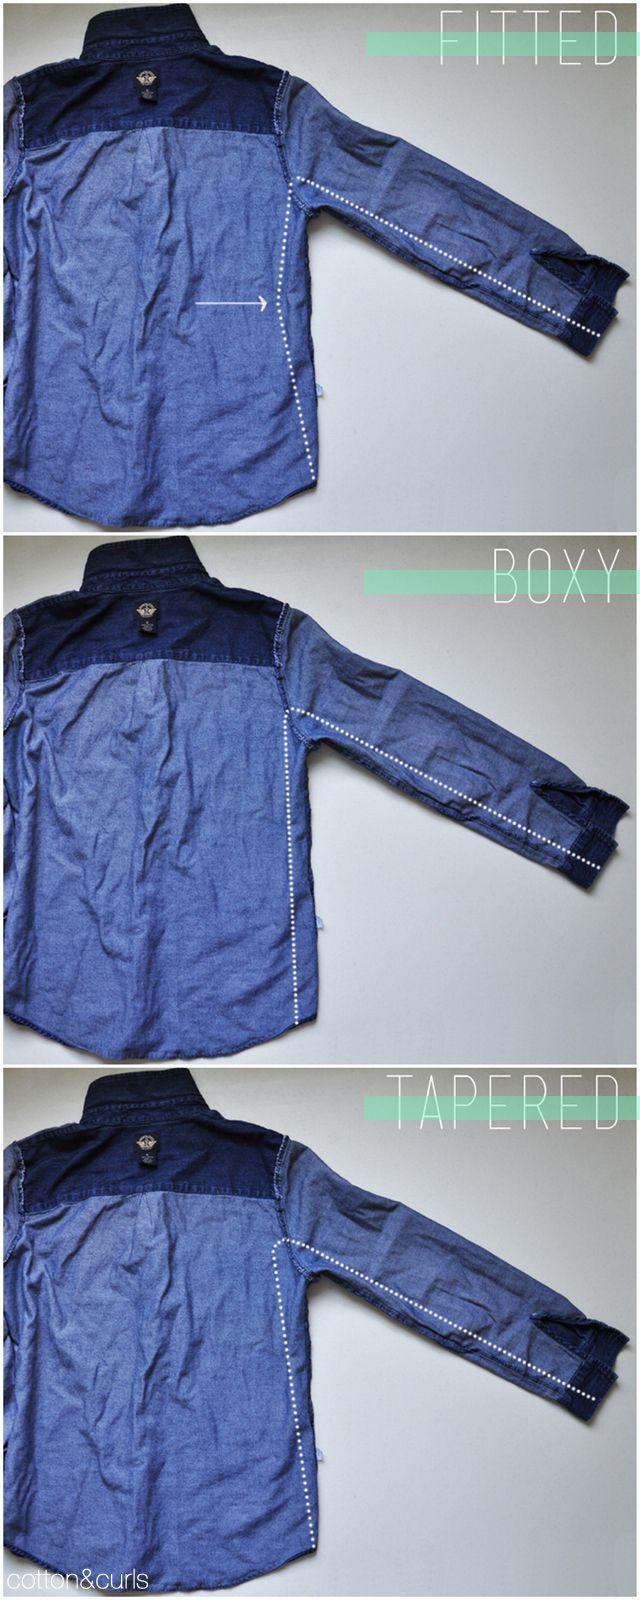 C: 3 ways to revamp a button up shirt